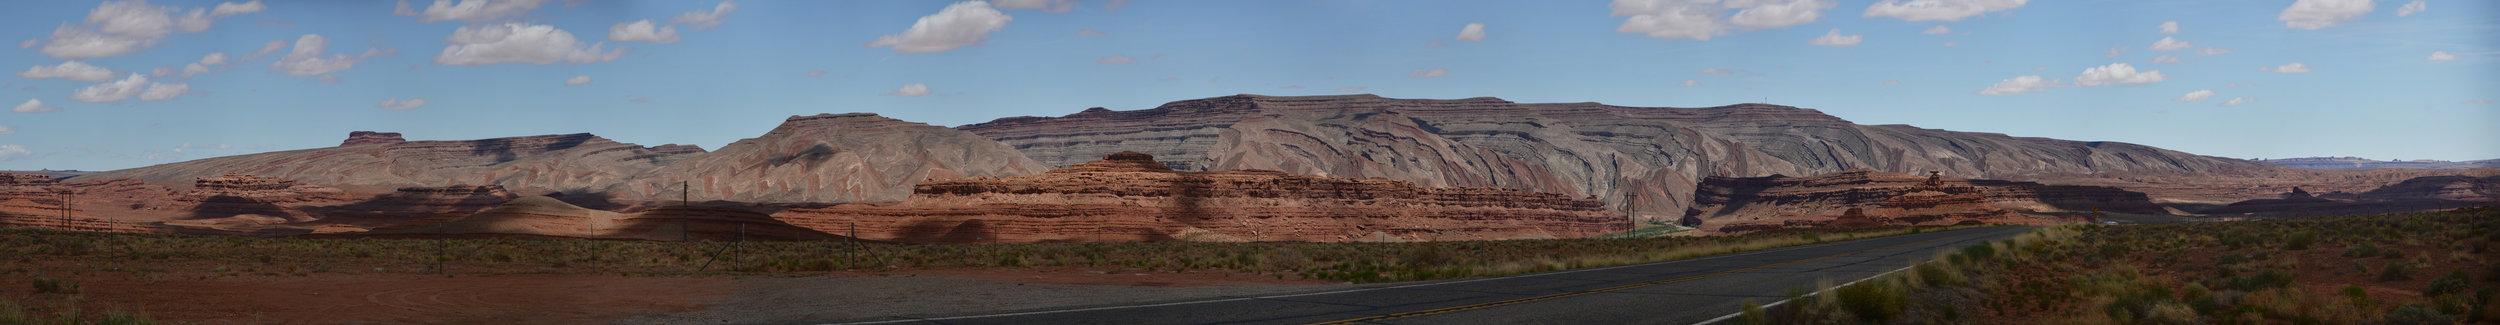 Surface Mining in AZ